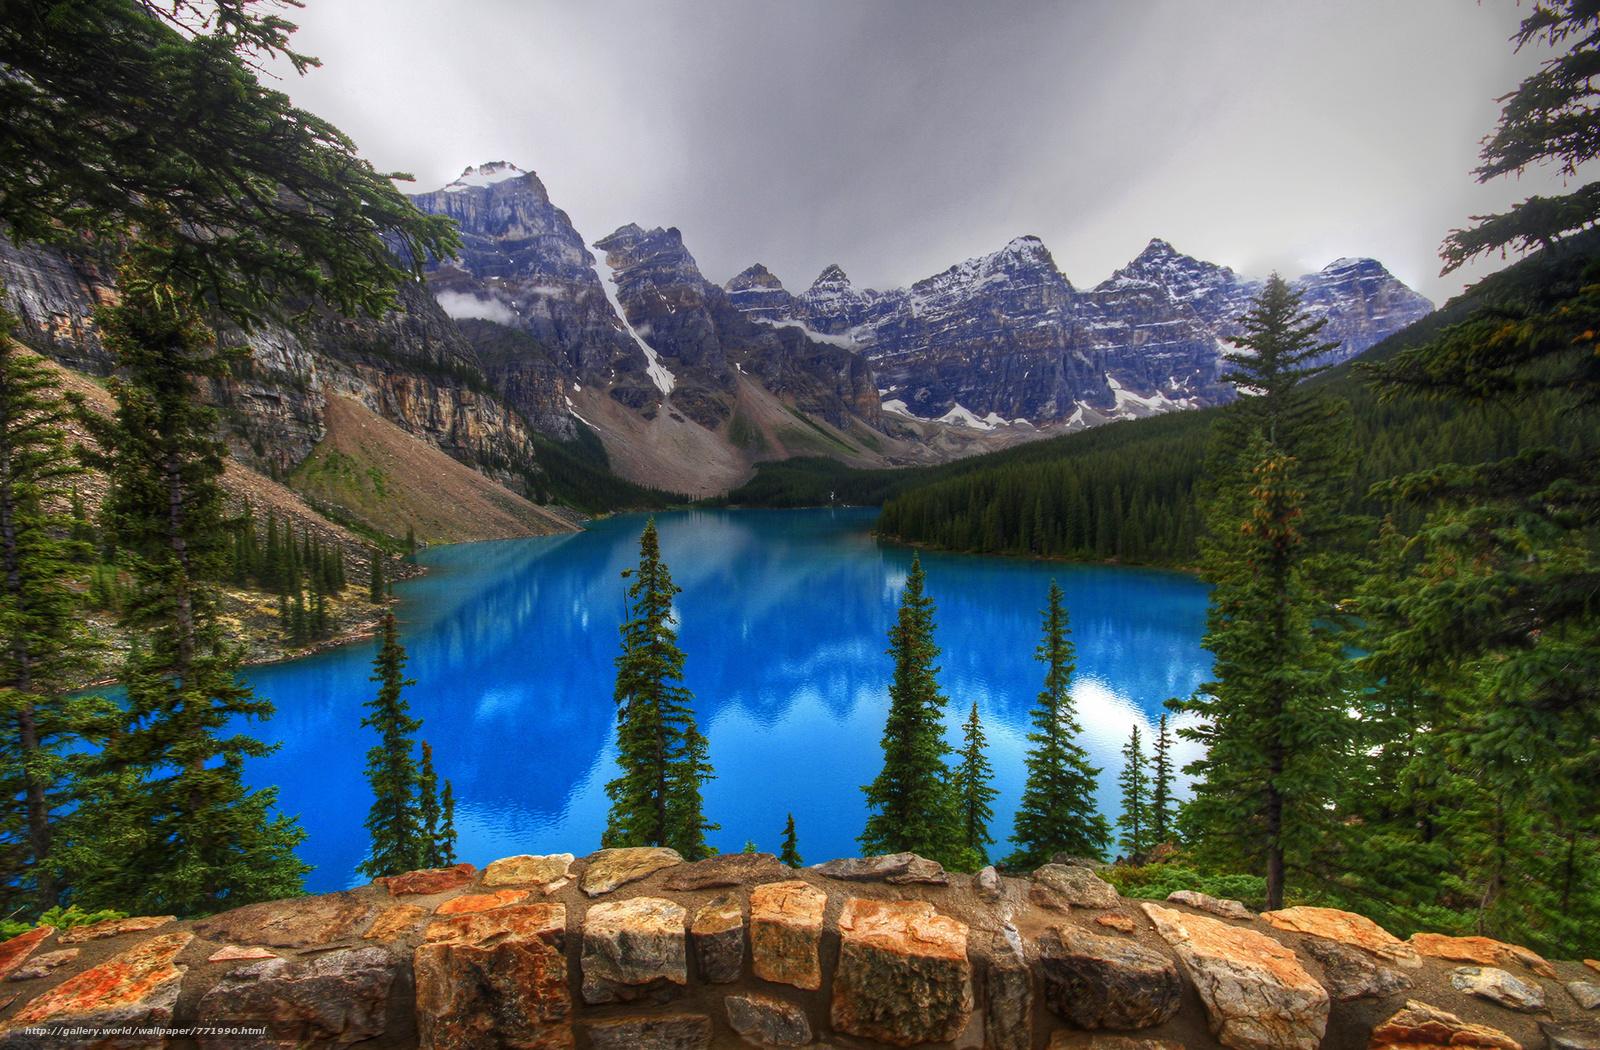 Lake Moraine, Canada, Lake Moraine, alberta, Canada, lake, the mountains, trees, rock, landscape